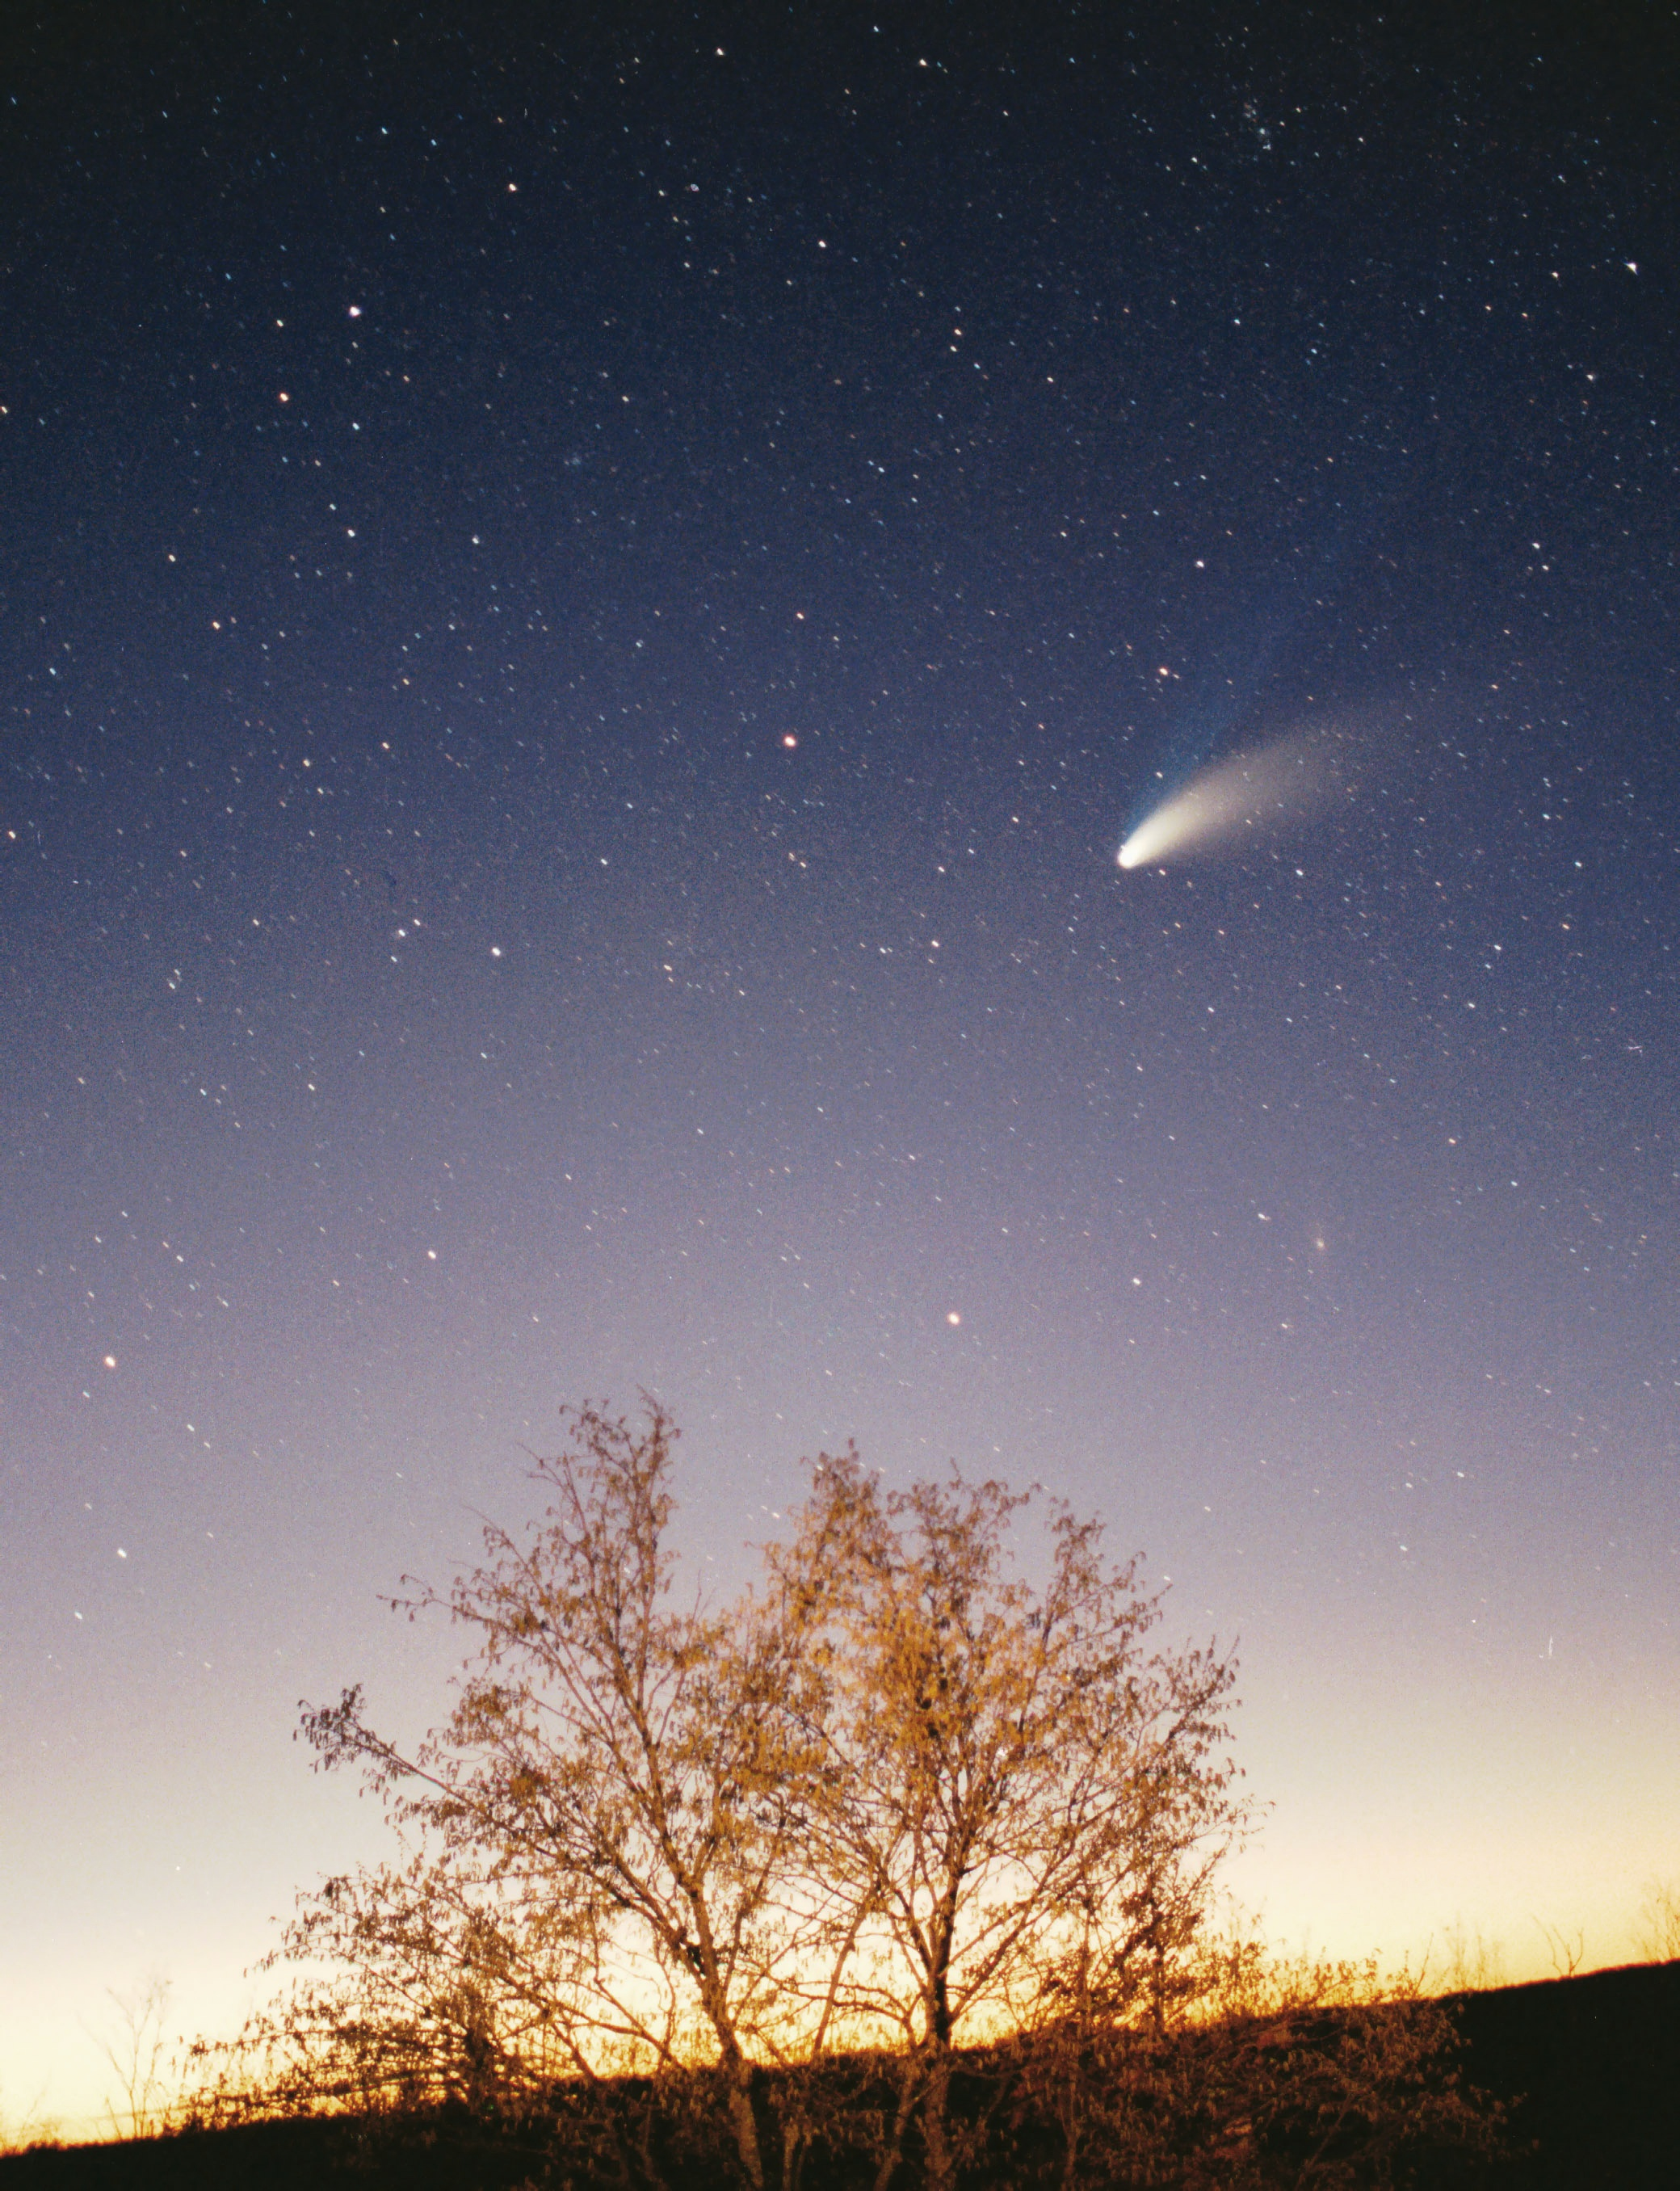 Comet Hale-Bopp over Croatia in March 1997, by Philipp Salzgeber via Wikimedia Commons